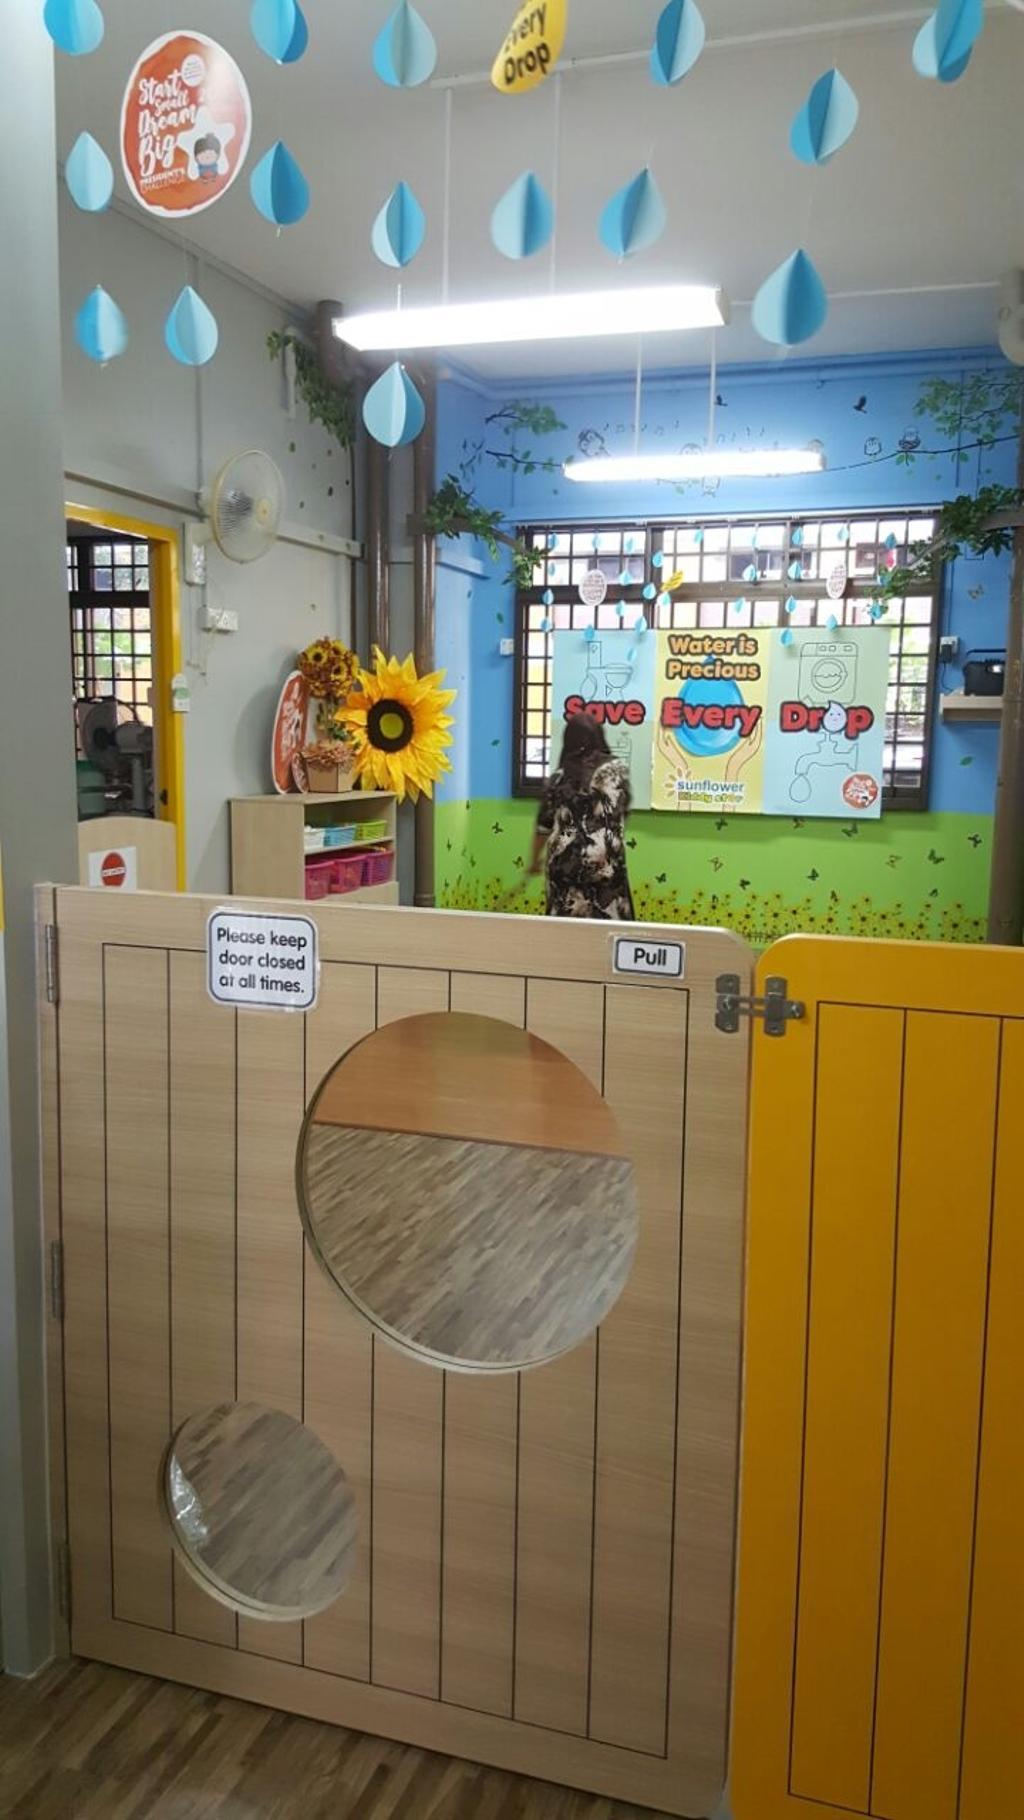 Sunflower Kindergarten, Commercial, Interior Designer, Interior Diary, Minimalistic, Human, People, Person